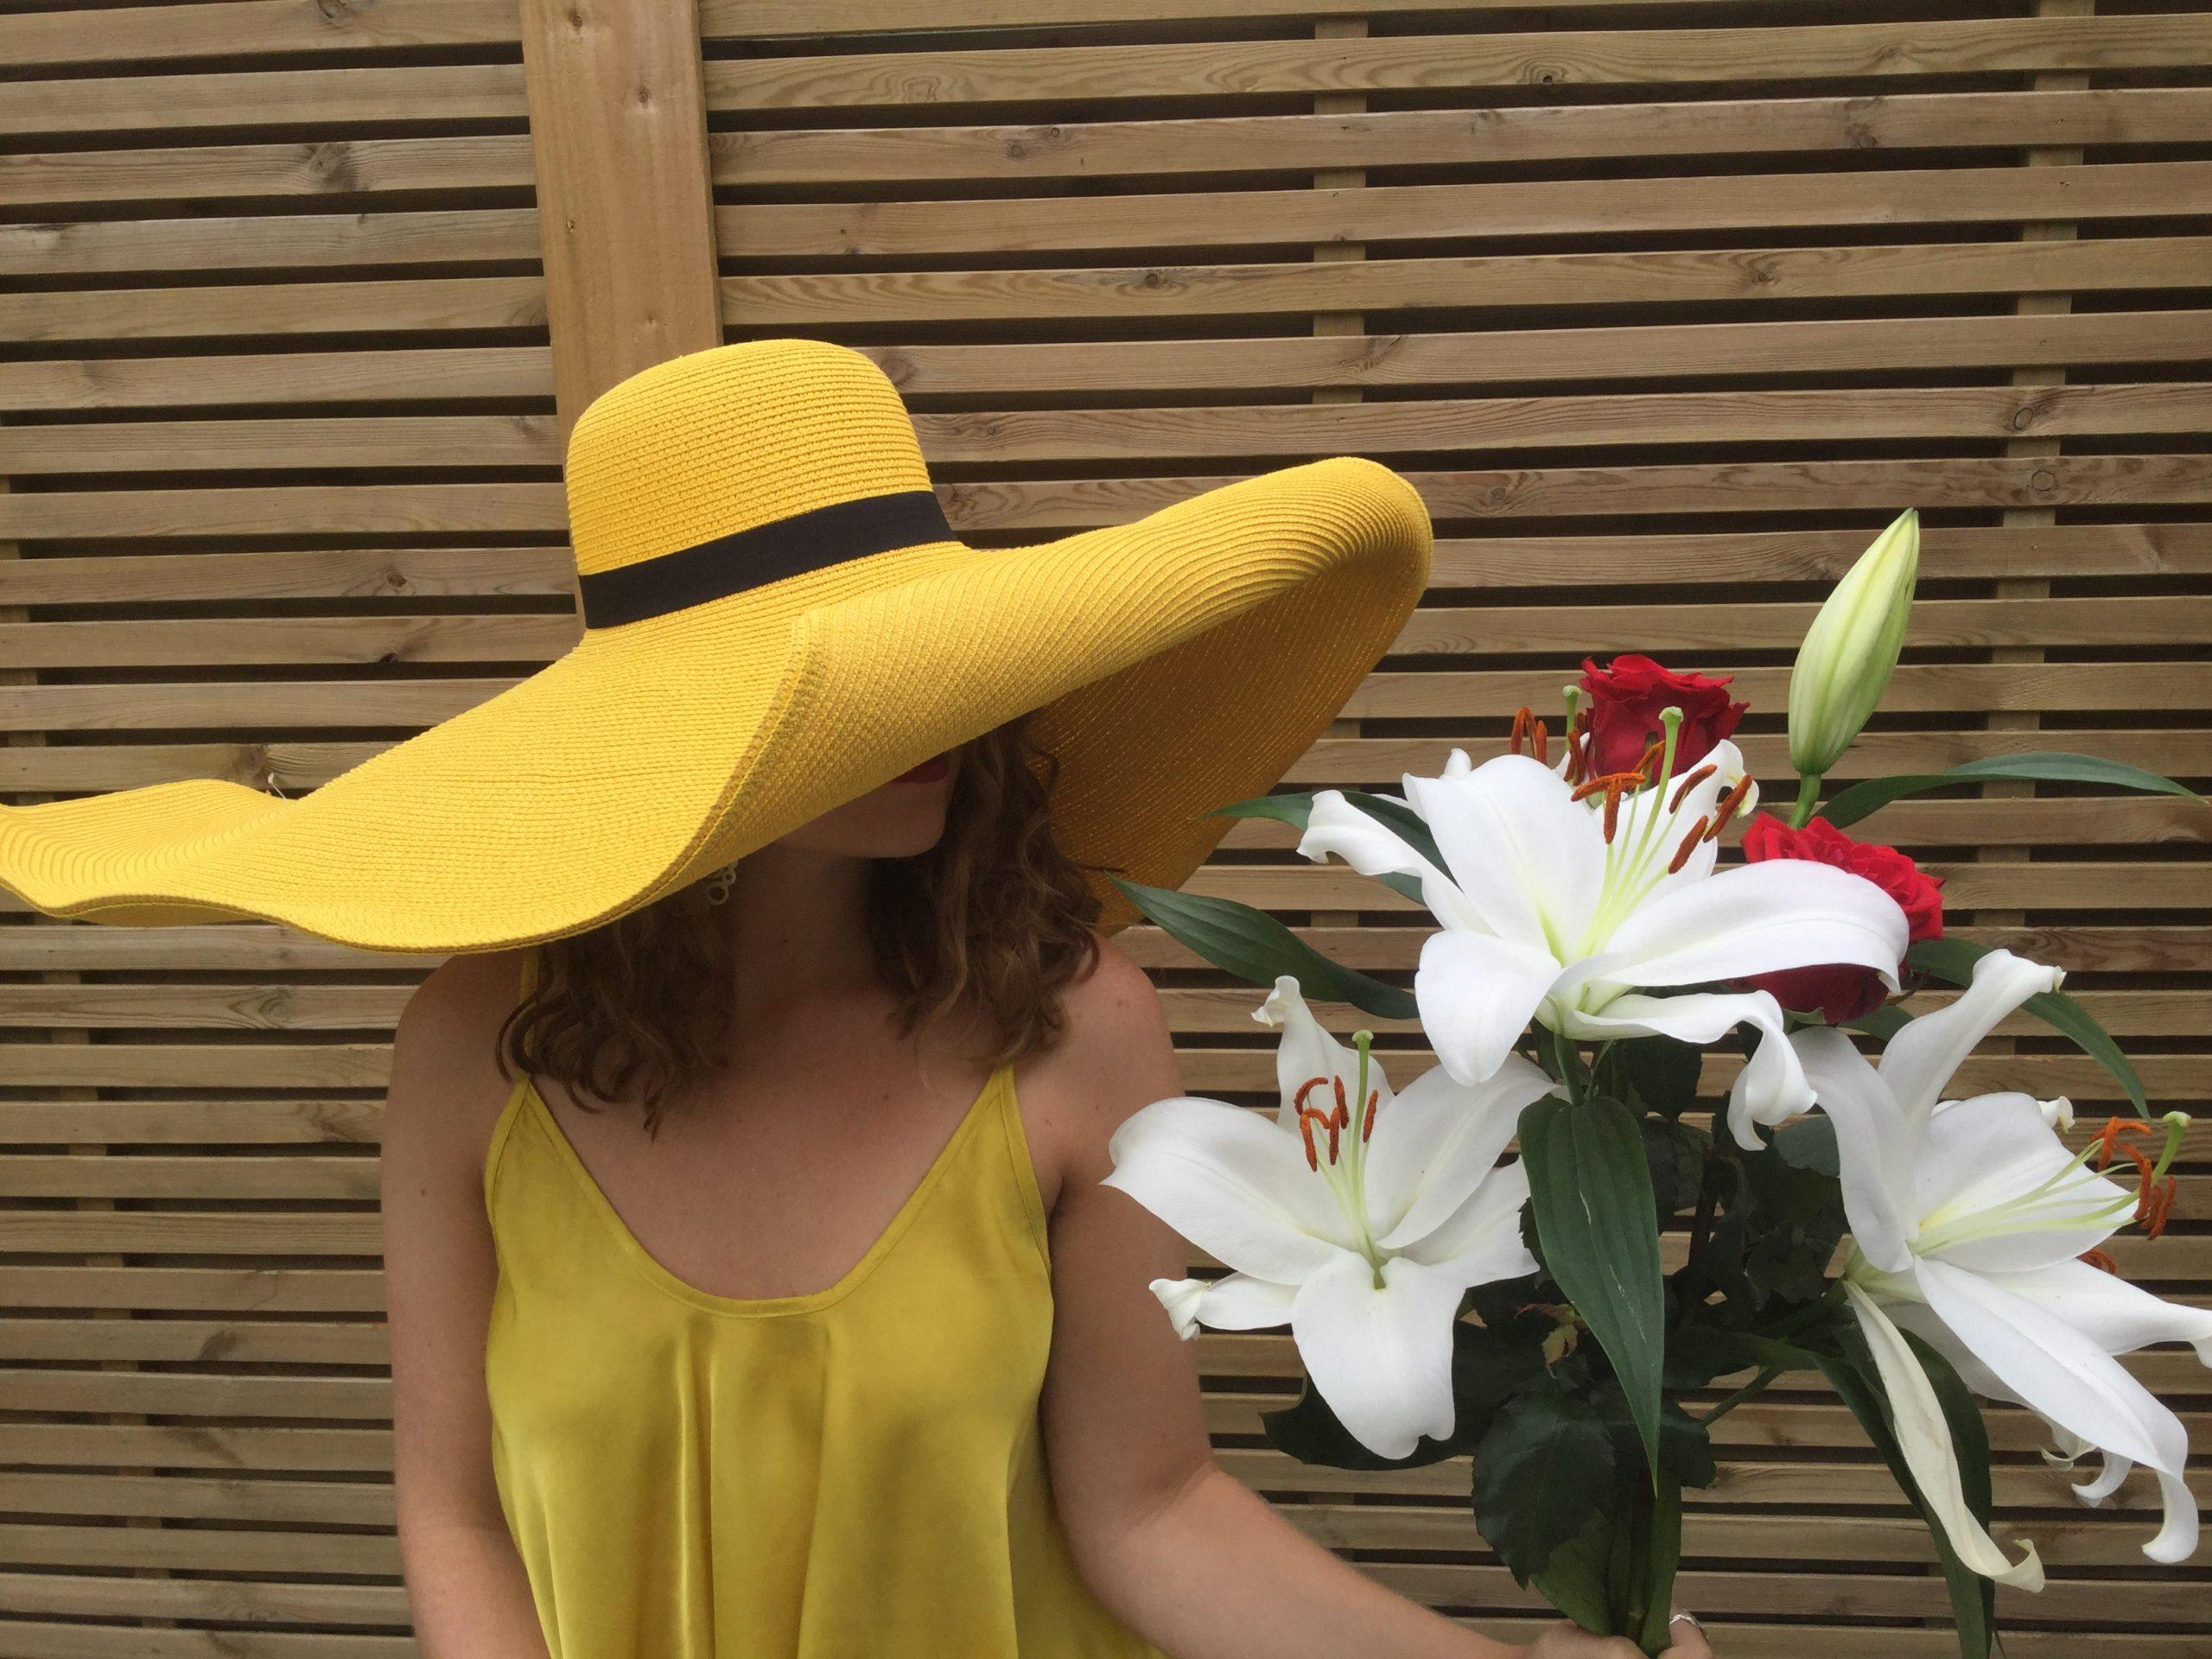 Samantha-Hat-Yellow